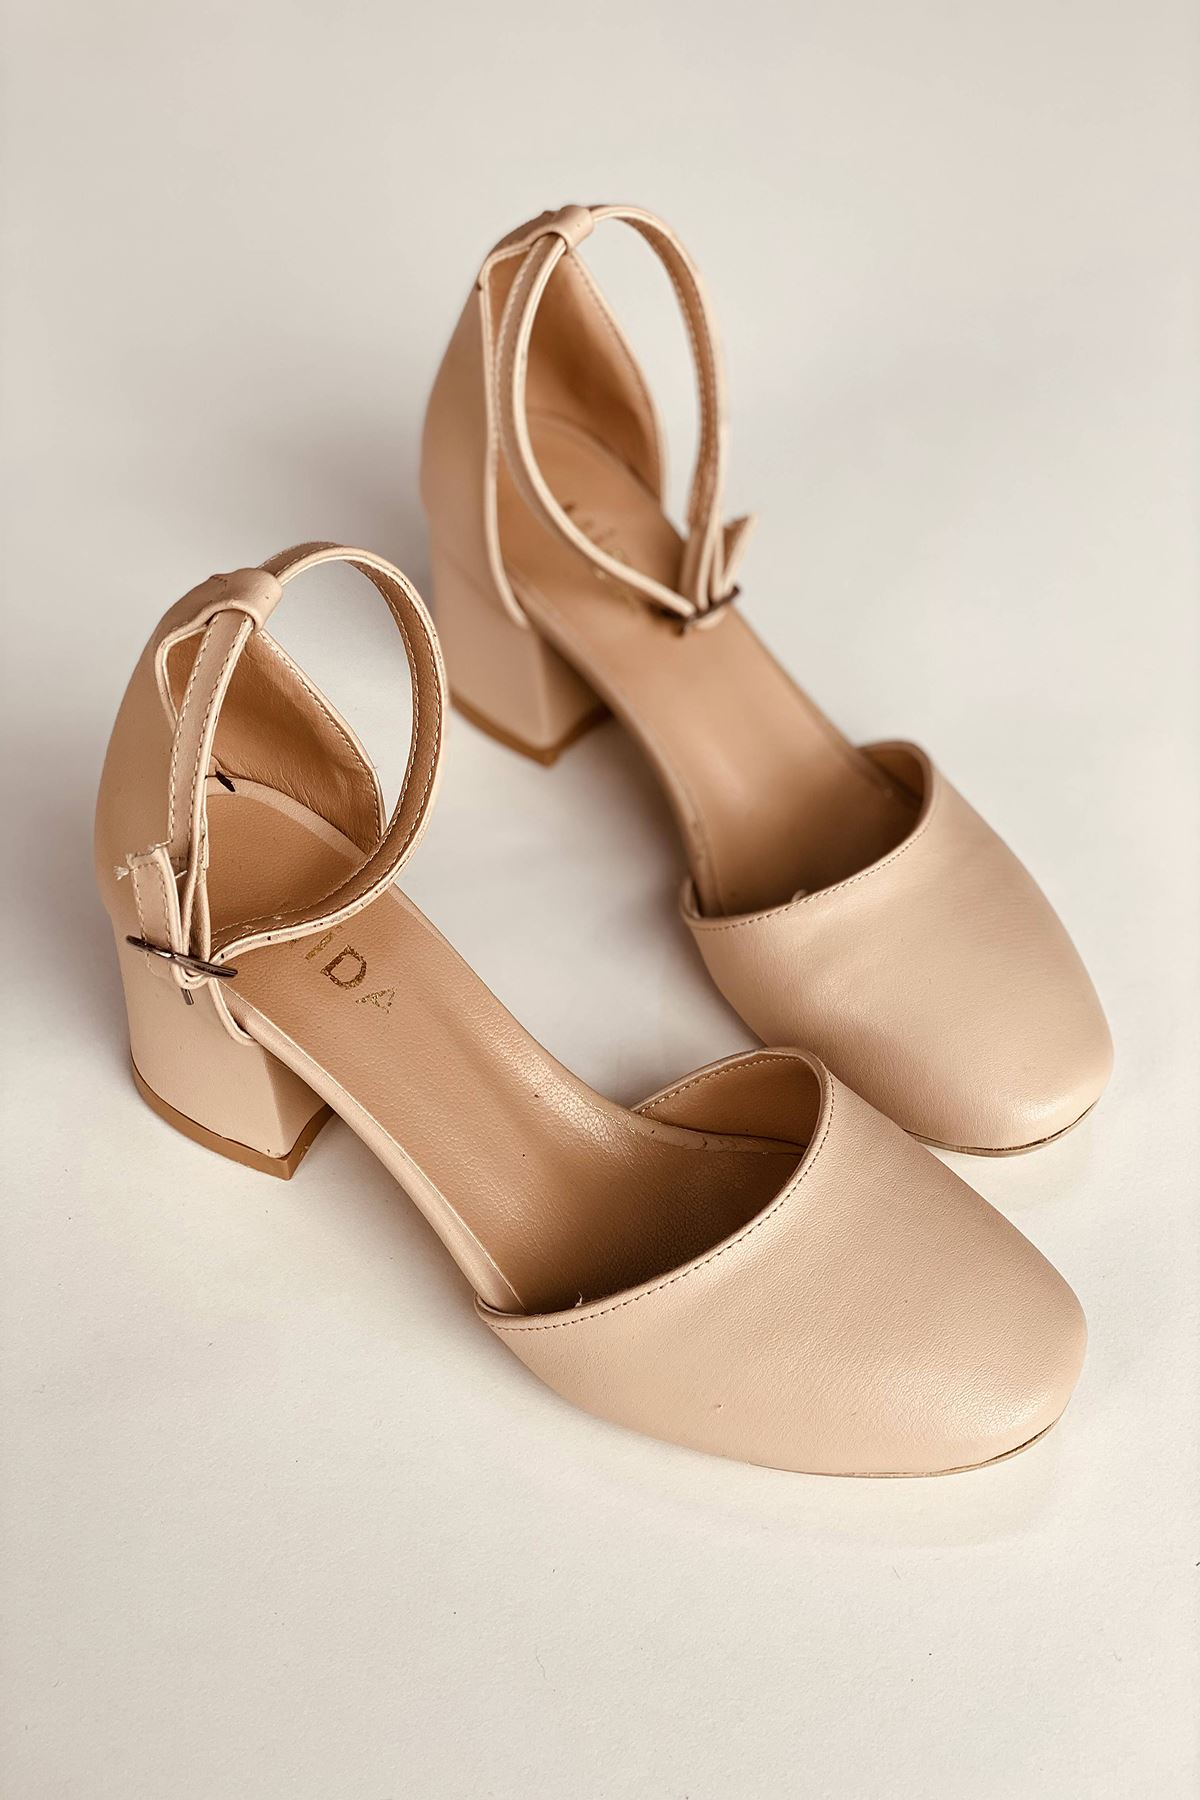 Y202 Pudra Deri Topuklu Ayakkabı